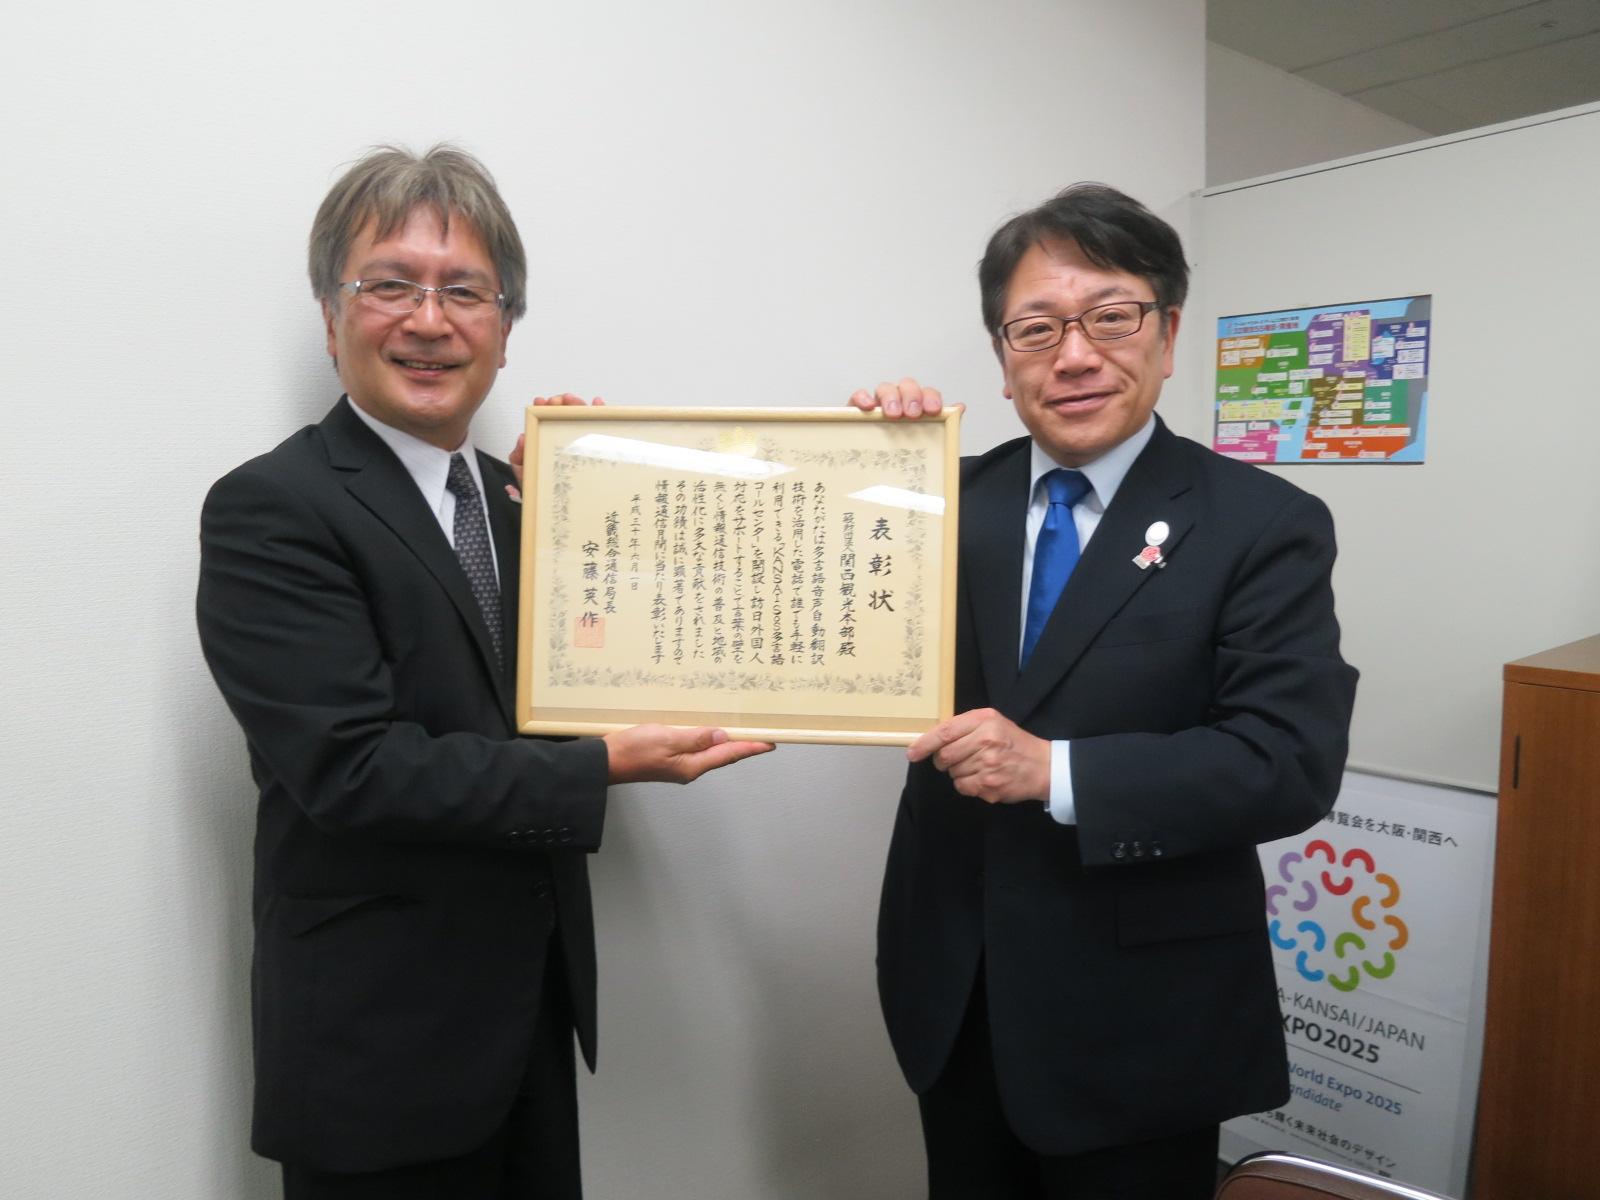 「KANSAI SOS 多言語コールセンター」が「情報通信月間」近畿総合通信局長表彰を受賞しました